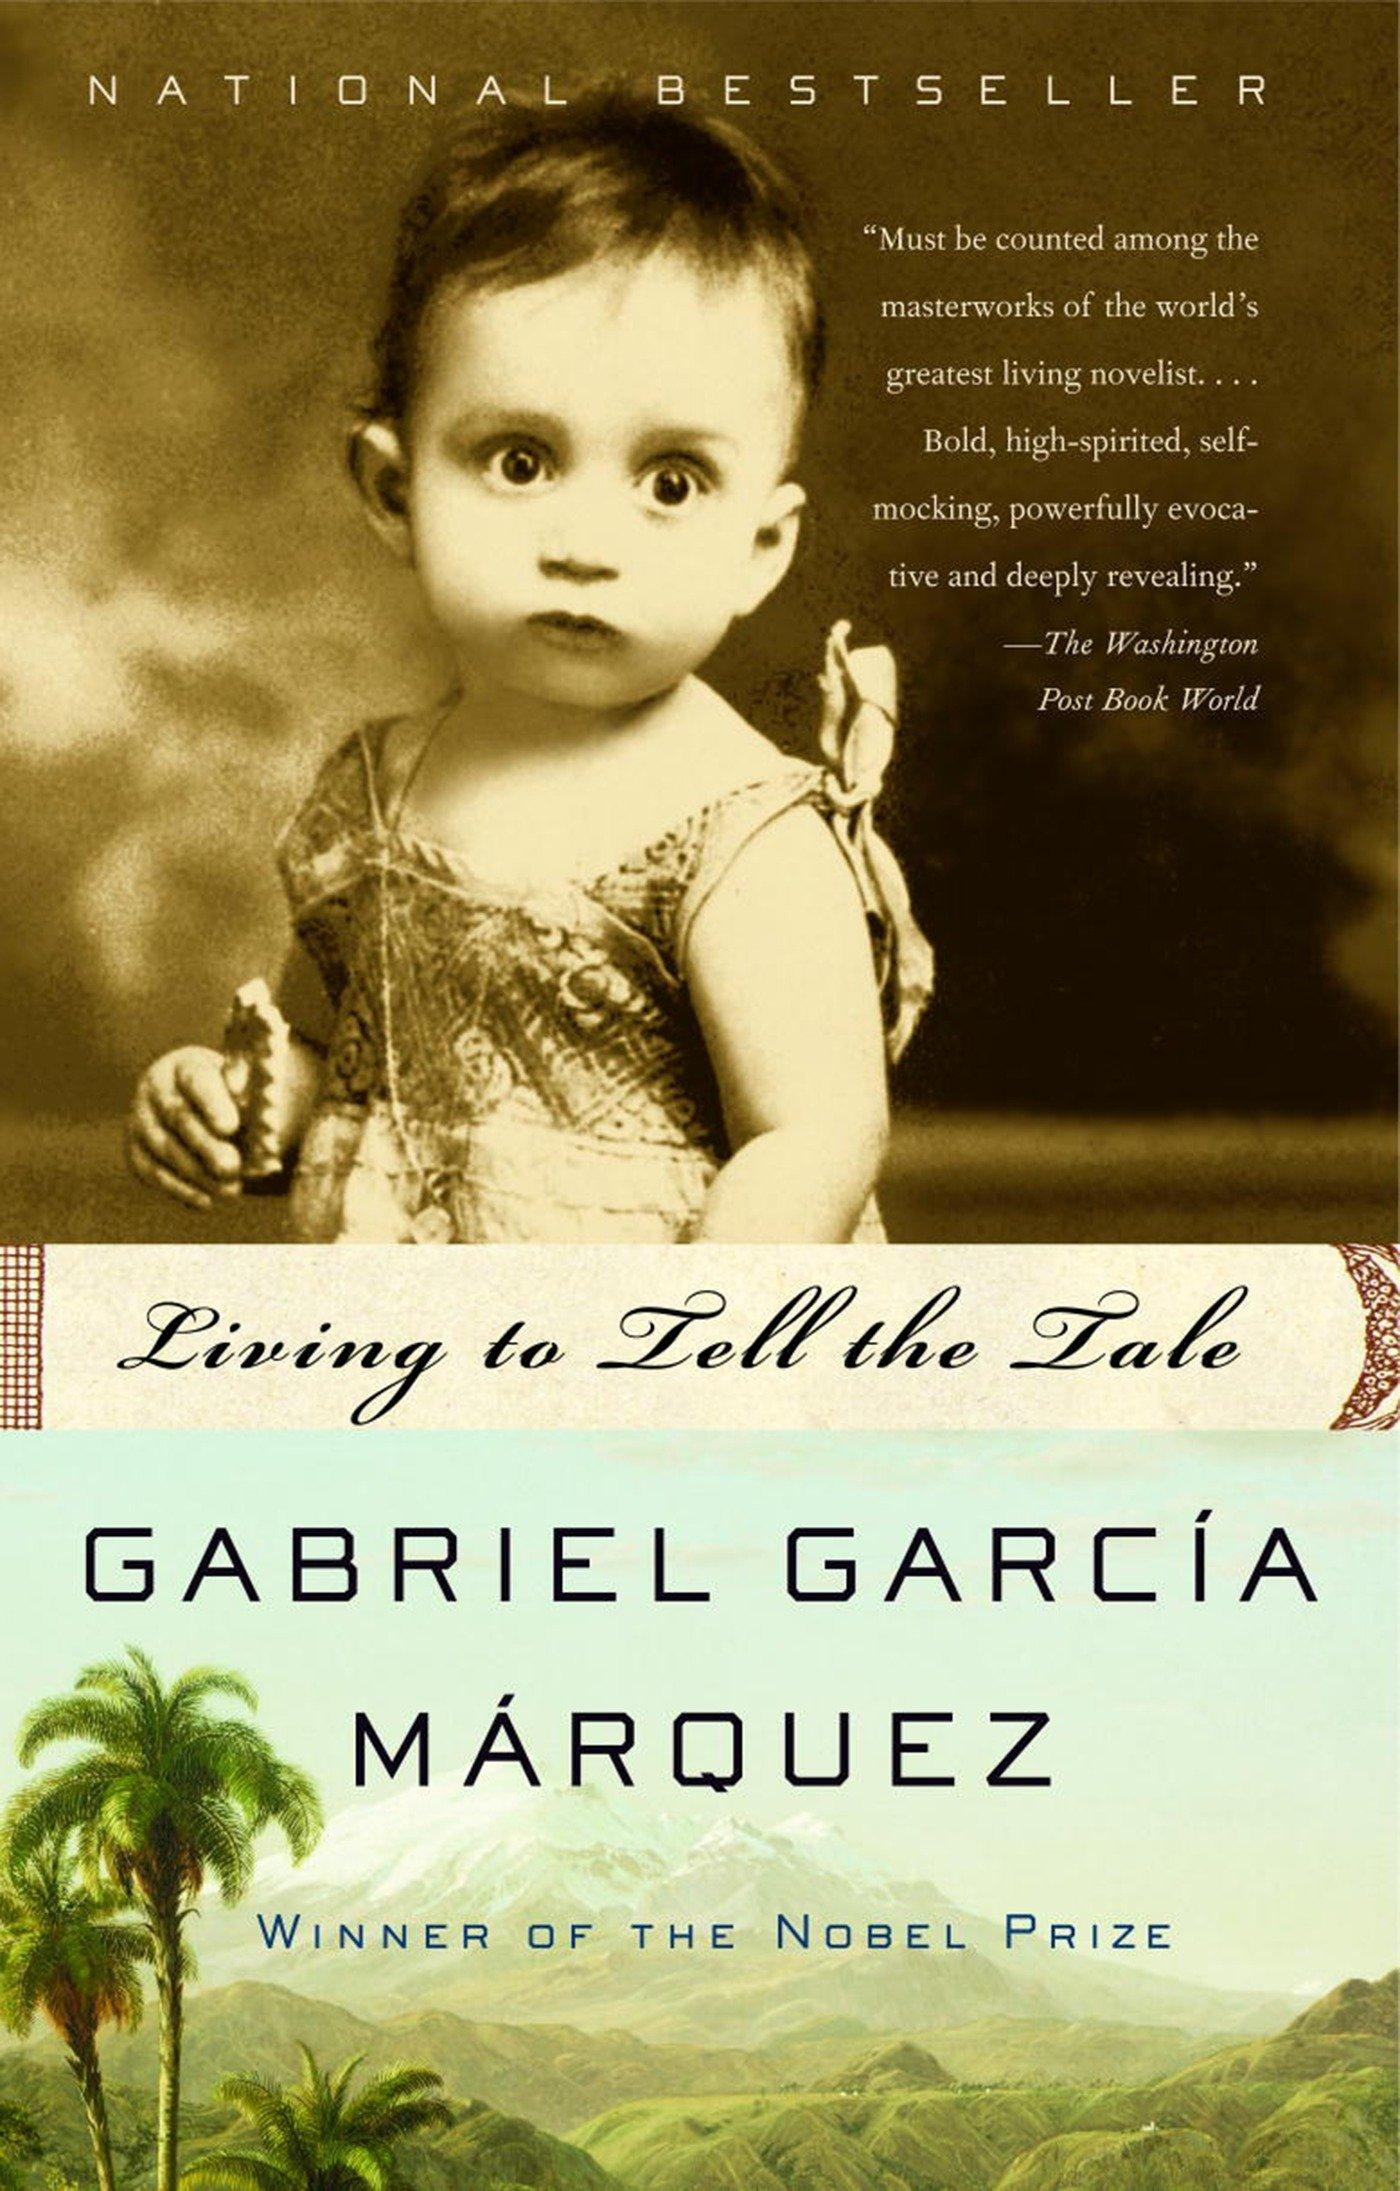 Living to Tell the Tale Paperback – October 12, 2004 Gabriel García Márquez Edith Grossman Vintage 140003454X